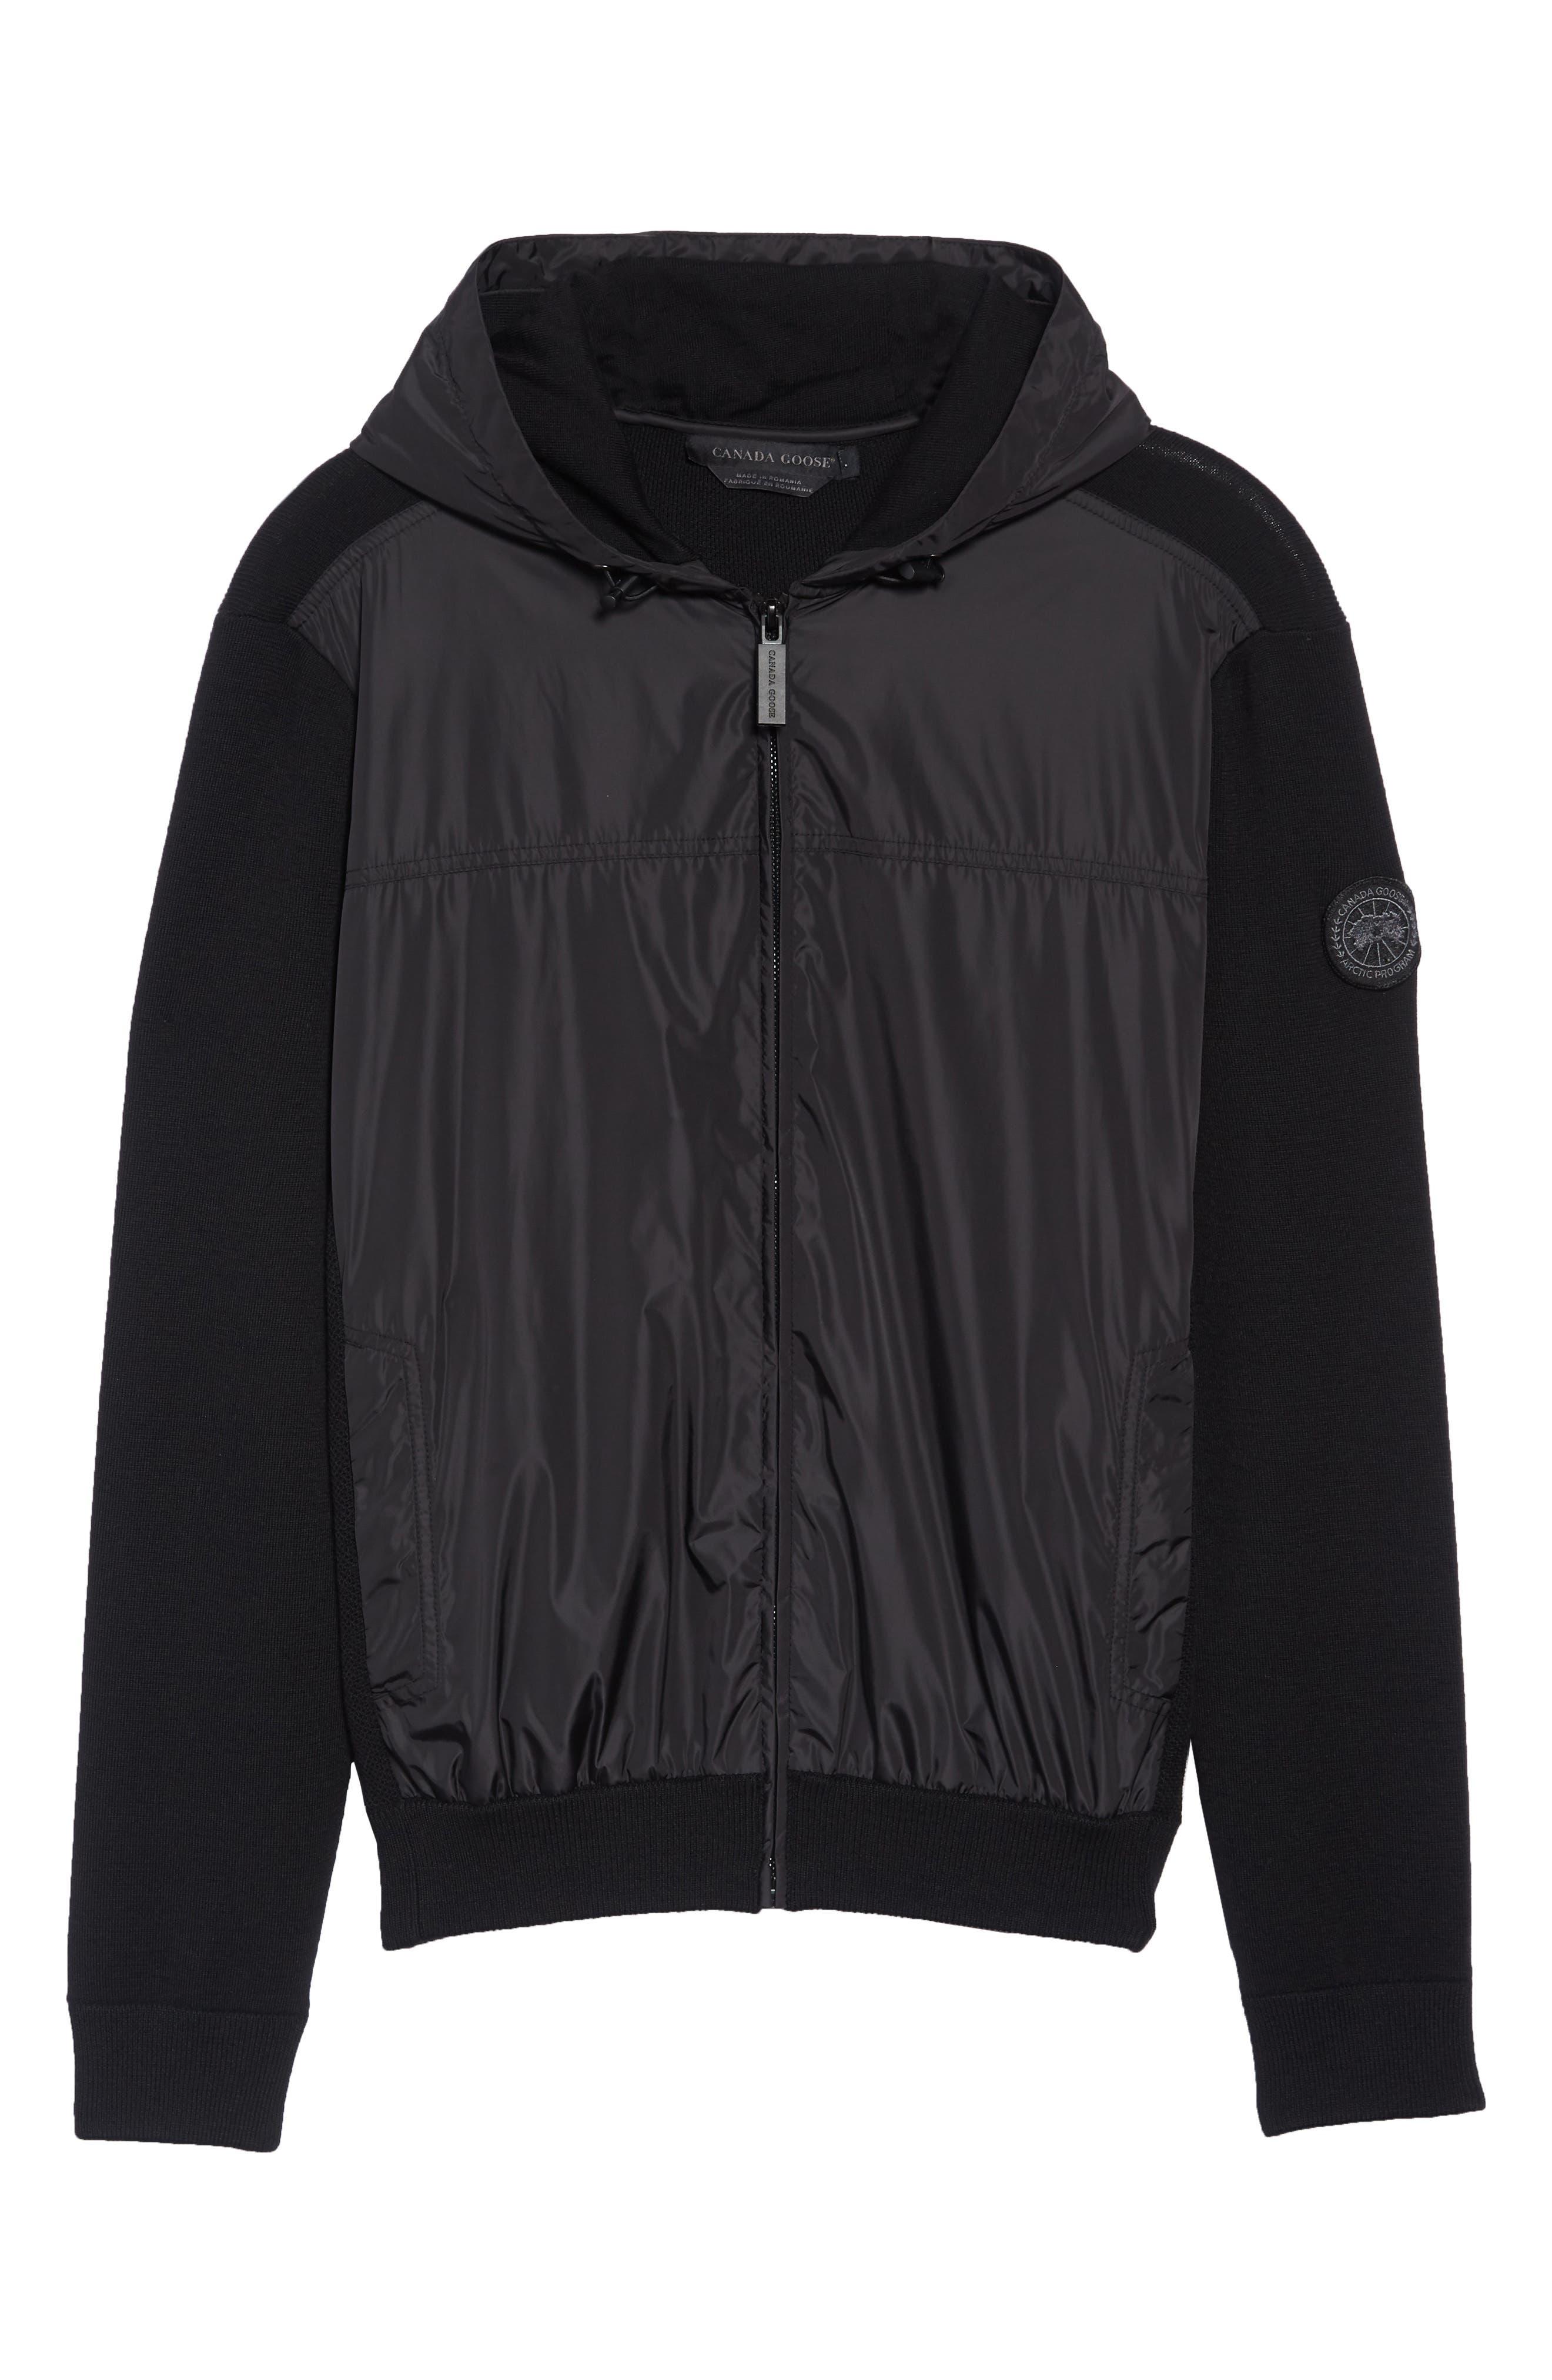 Windbridge Regular Fit Hooded Sweater Jacket,                             Alternate thumbnail 6, color,                             BLACK